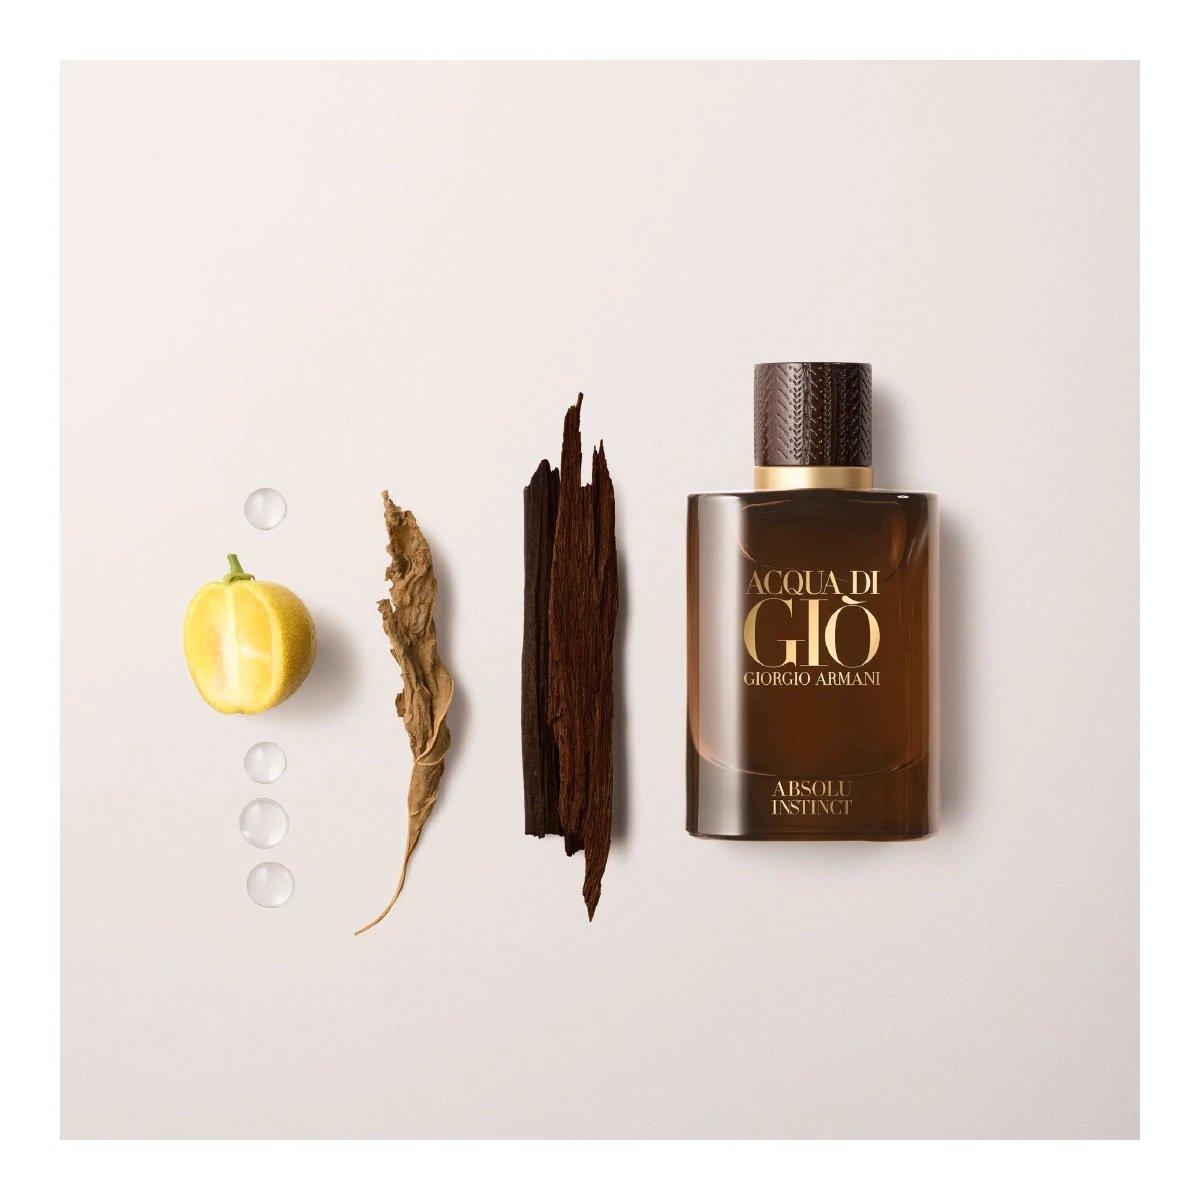 Giorgio Armani Acqua di Gio Absolu Instinct Perfume